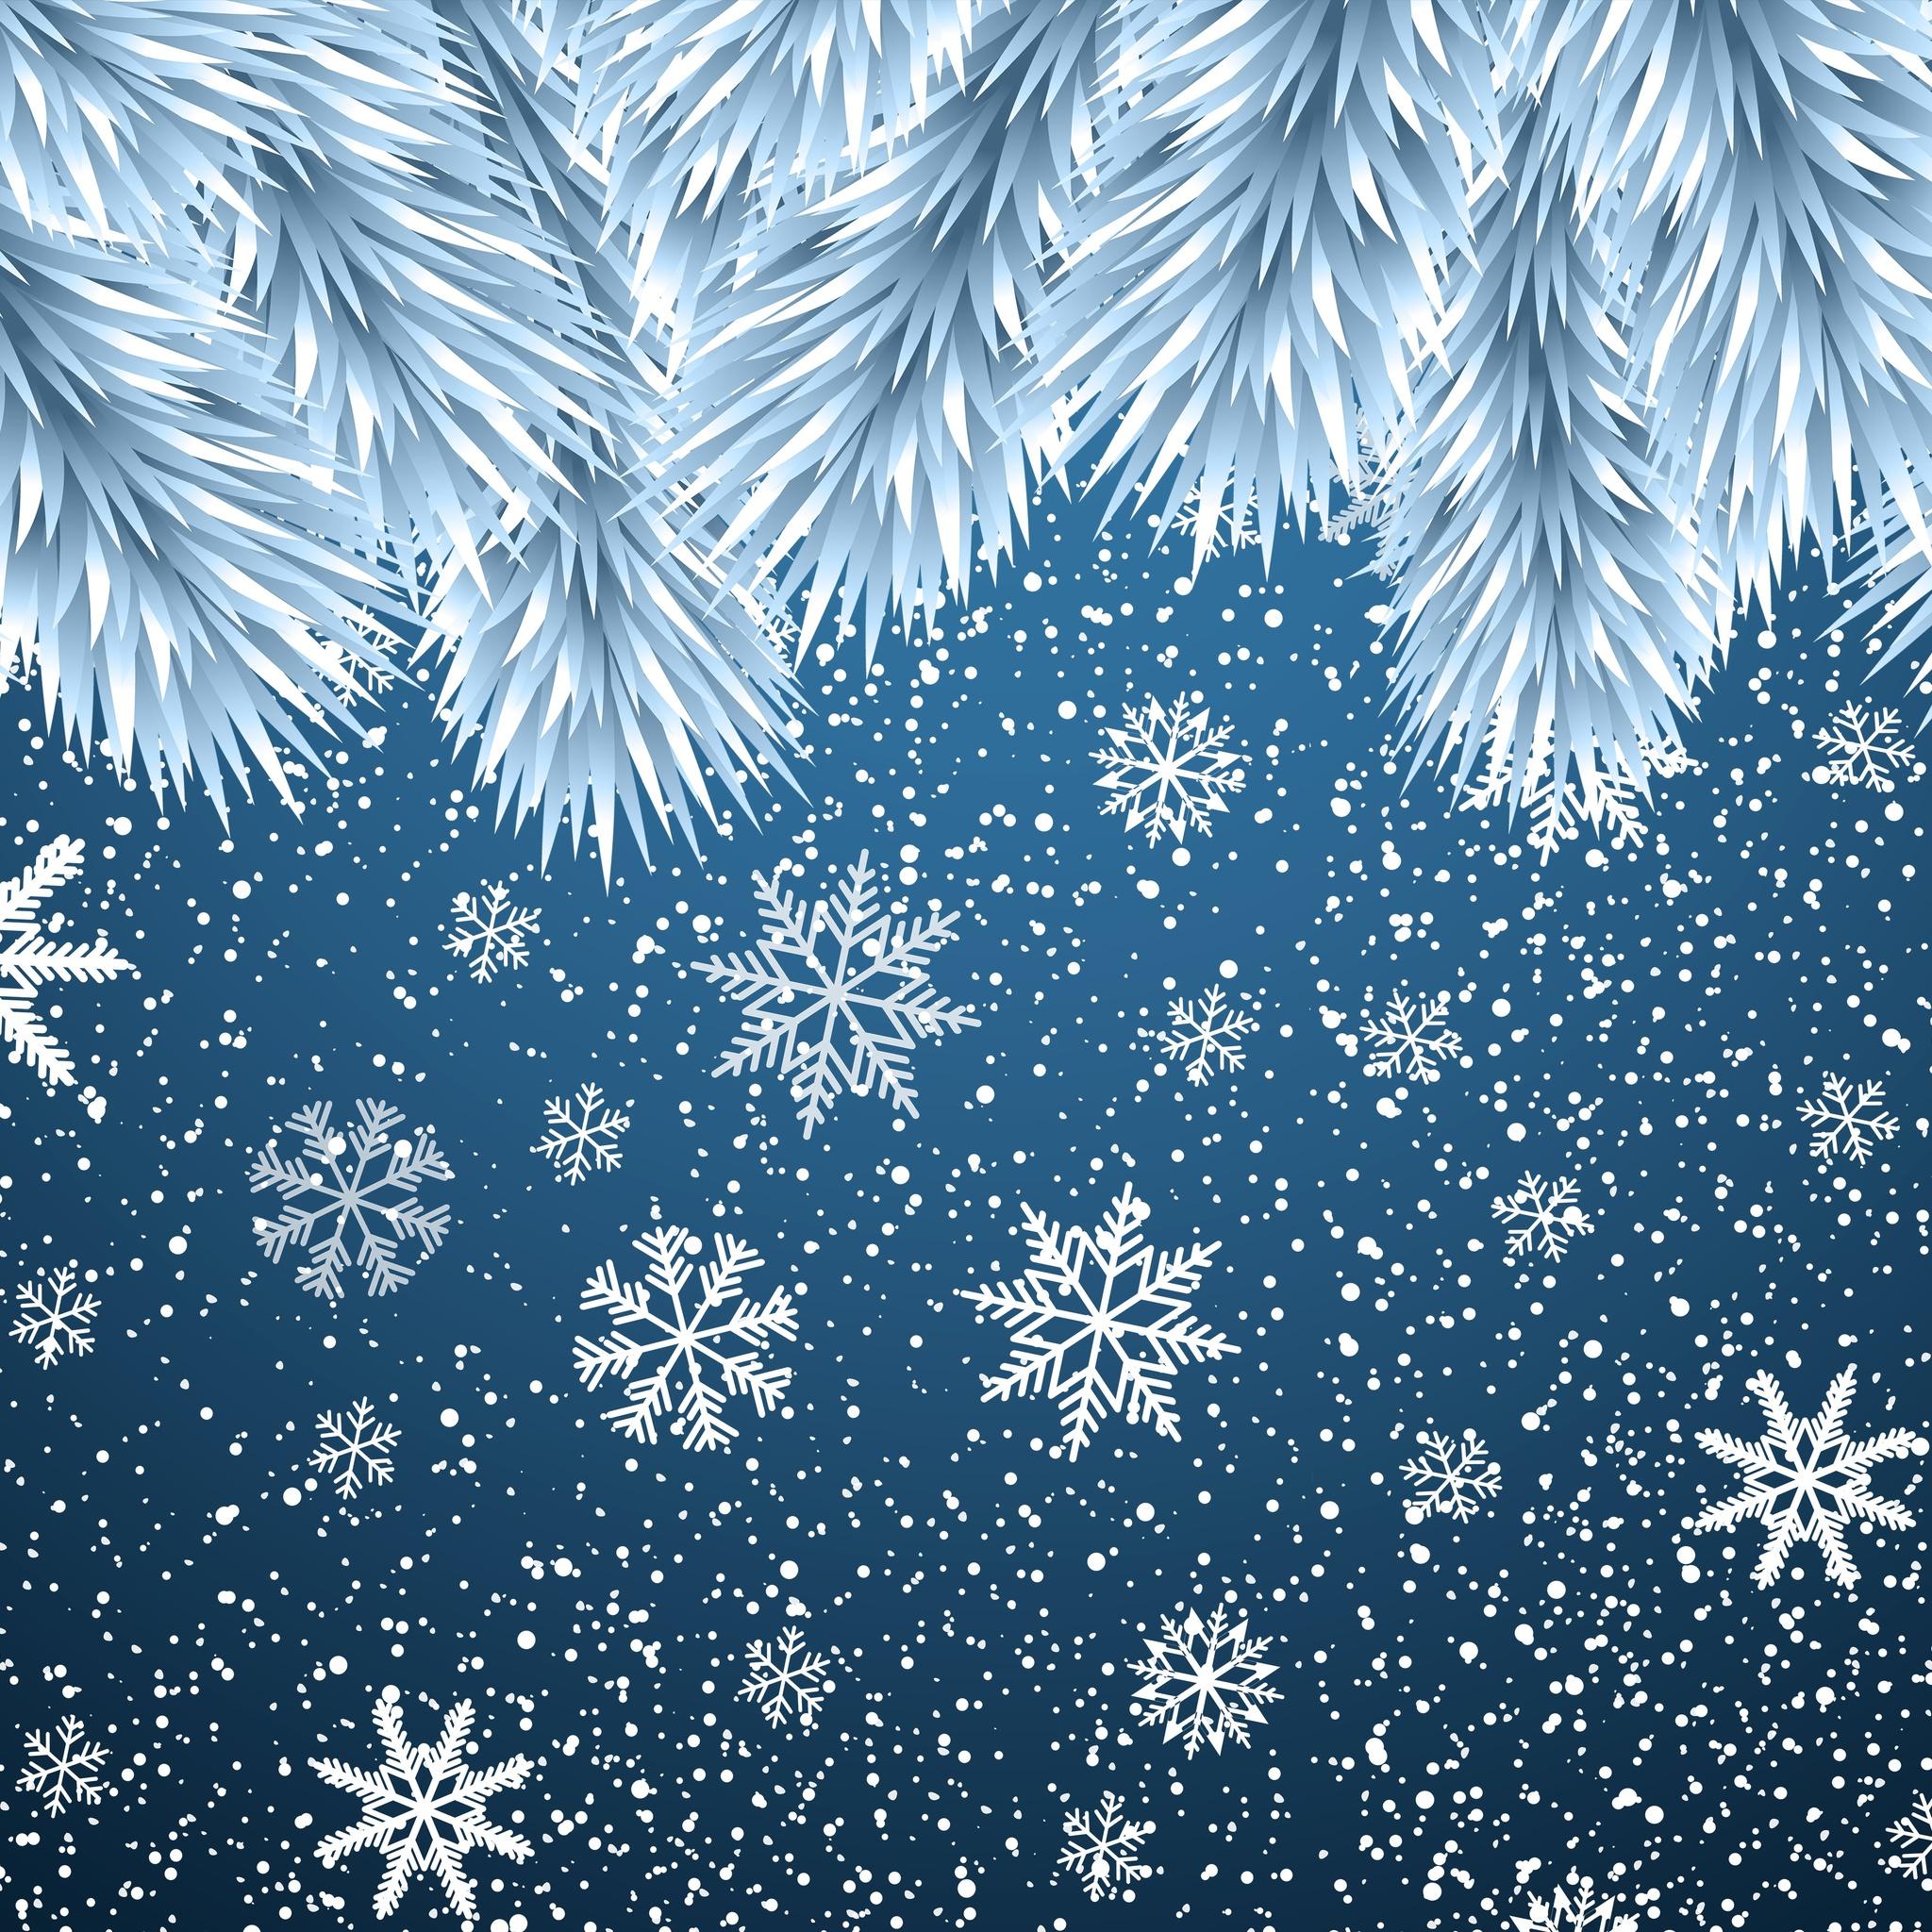 2048x2048 Christmas Snowflakes Background 8k Ipad Air Hd 4k